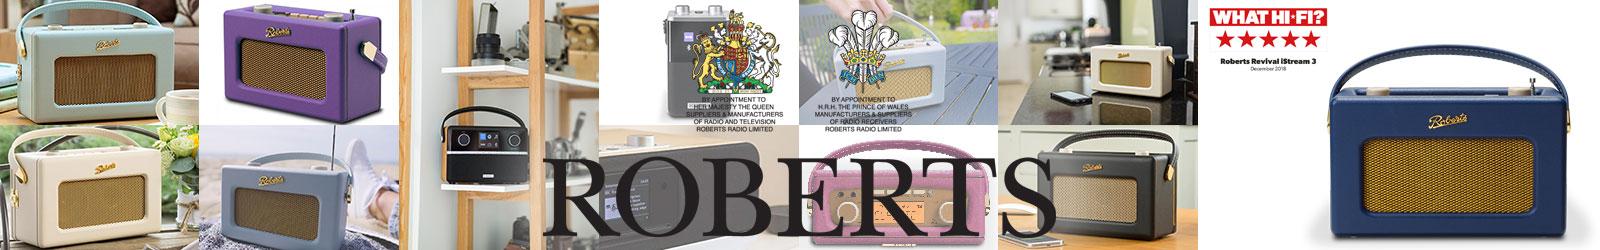 Roberts Banner